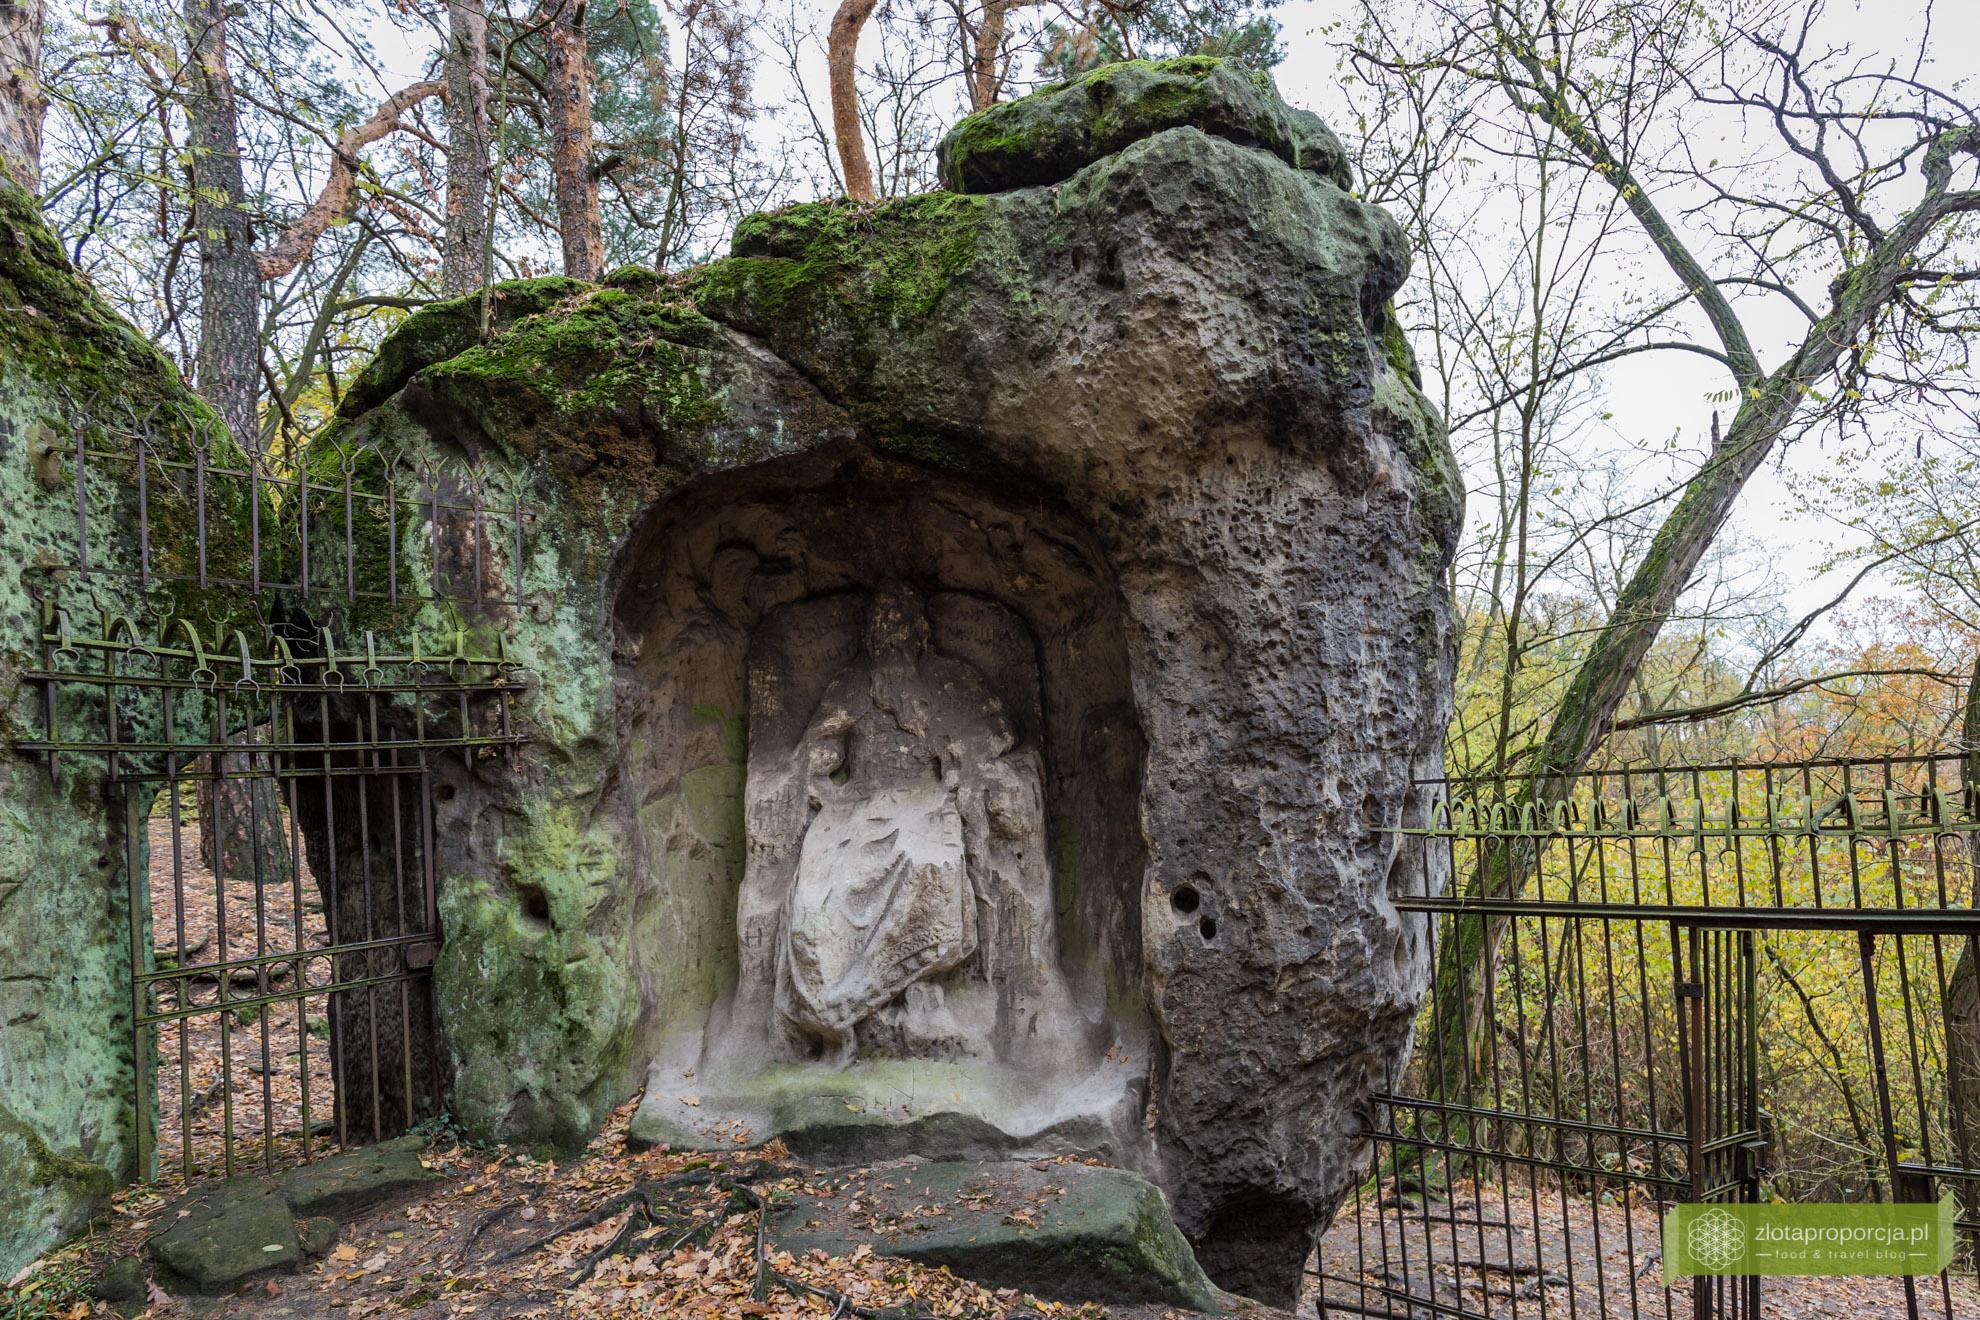 Klacelka, Kokorinsko, atrakcje Kokorinsko, sklane rzeźby Vaclava Levy, okolice Pragi, Czechy